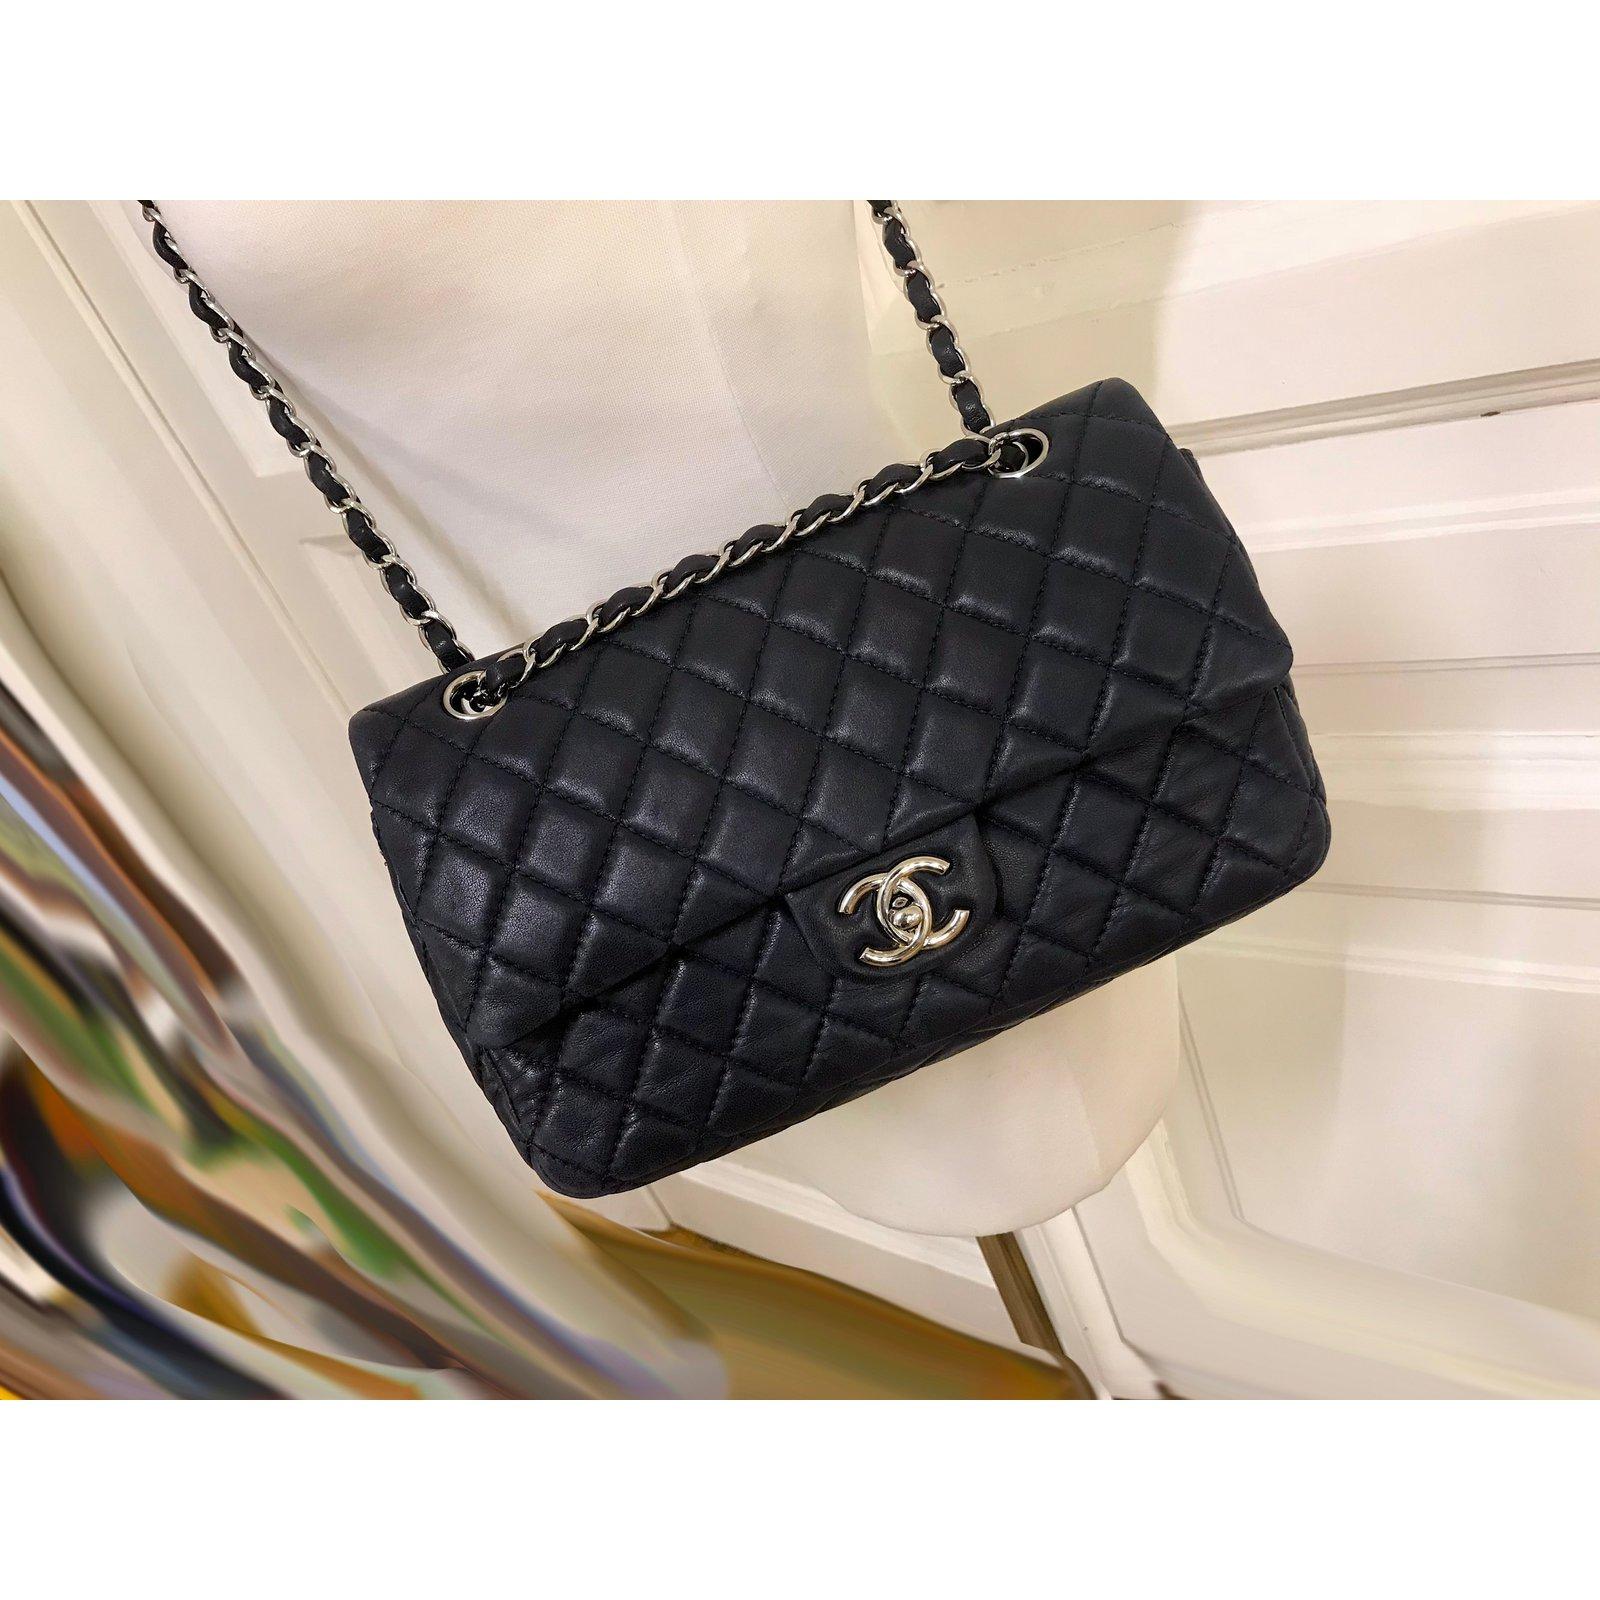 8d0b3d8c80e2c0 Chanel Timeless Medium Double Flap Bag Handbags Leather Navy blue ref.84310  - Joli Closet